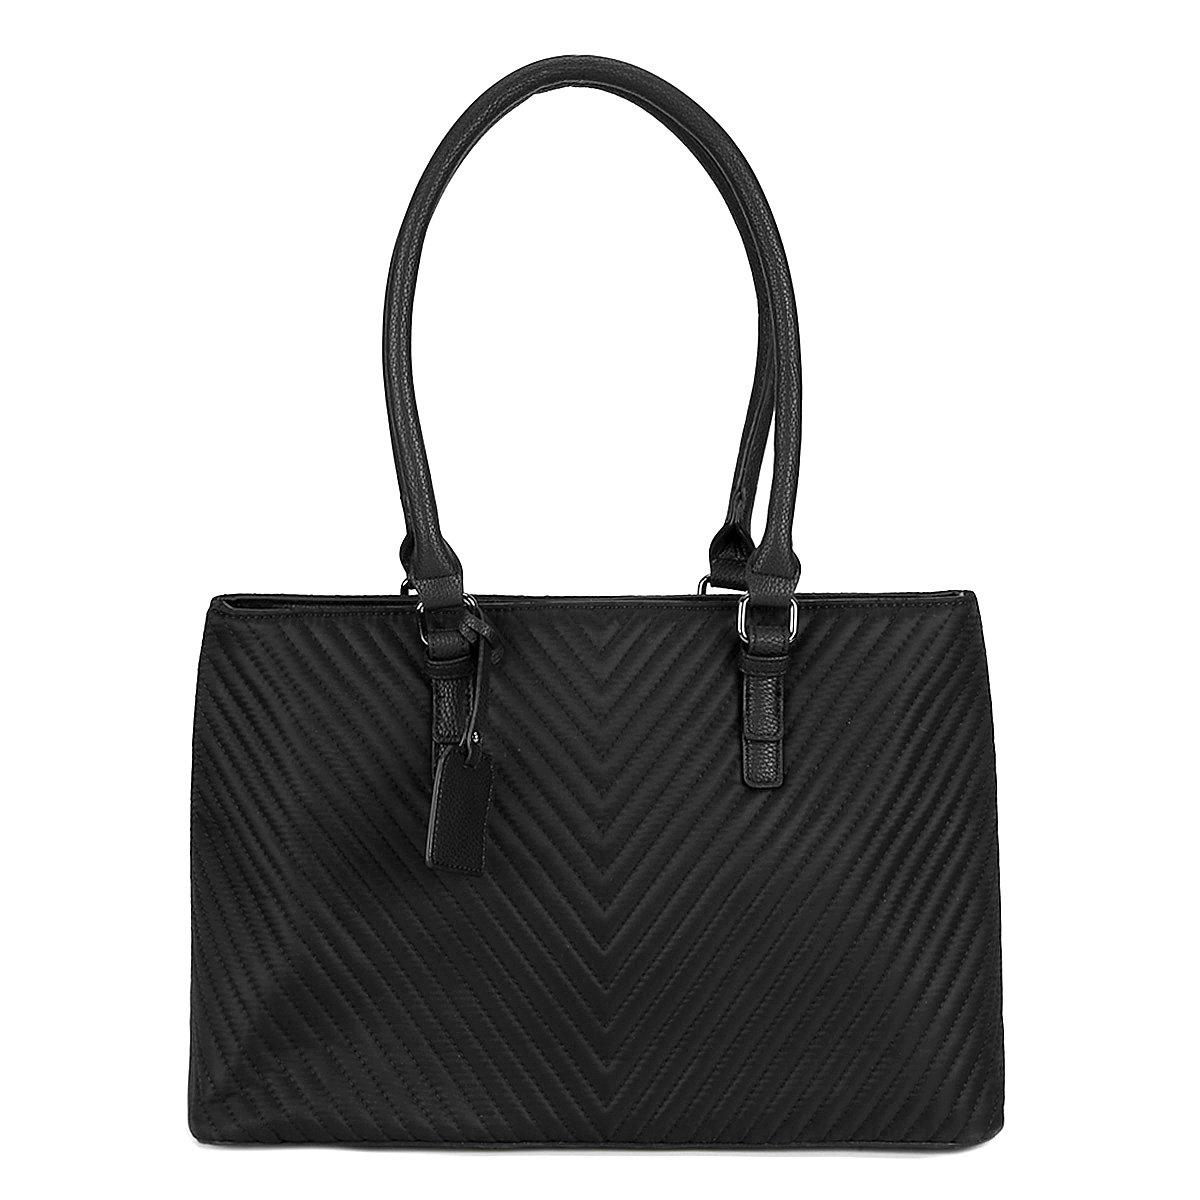 65abba5f5579f Bolsa Shoestock Executiva Matelassê Feminina - Compre Agora